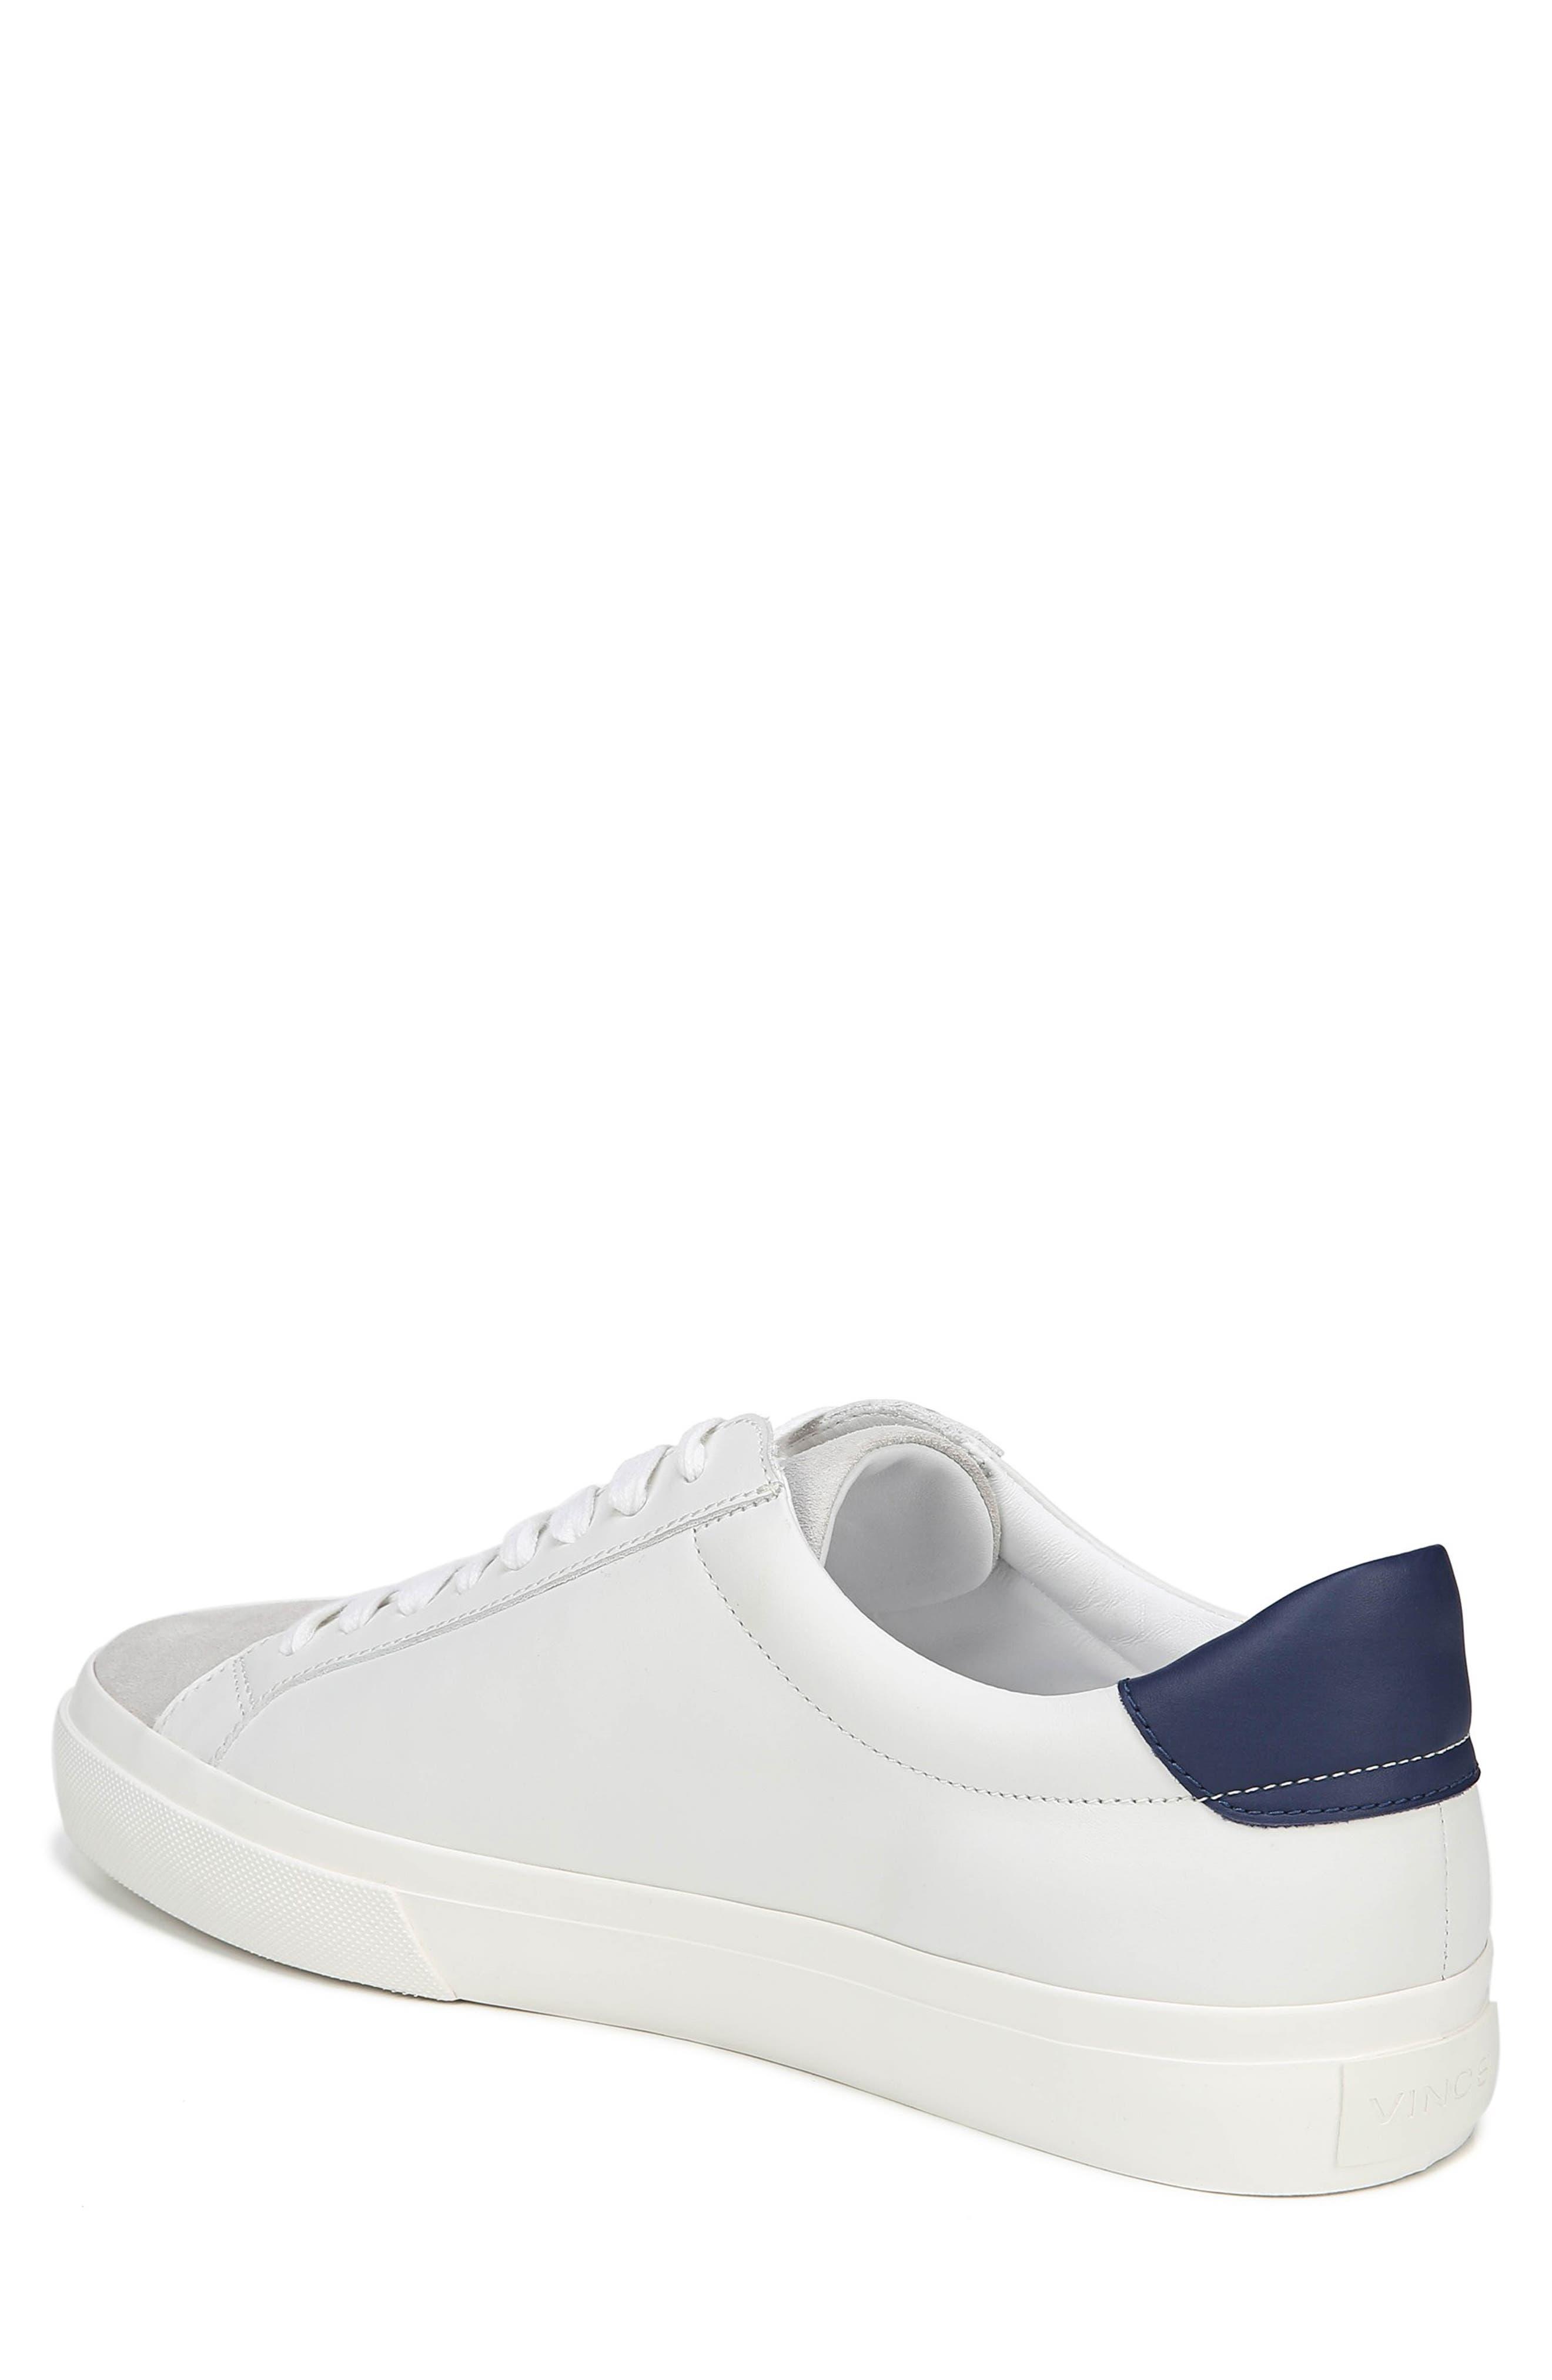 VINCE, Fulton Sneaker, Alternate thumbnail 2, color, WHITE